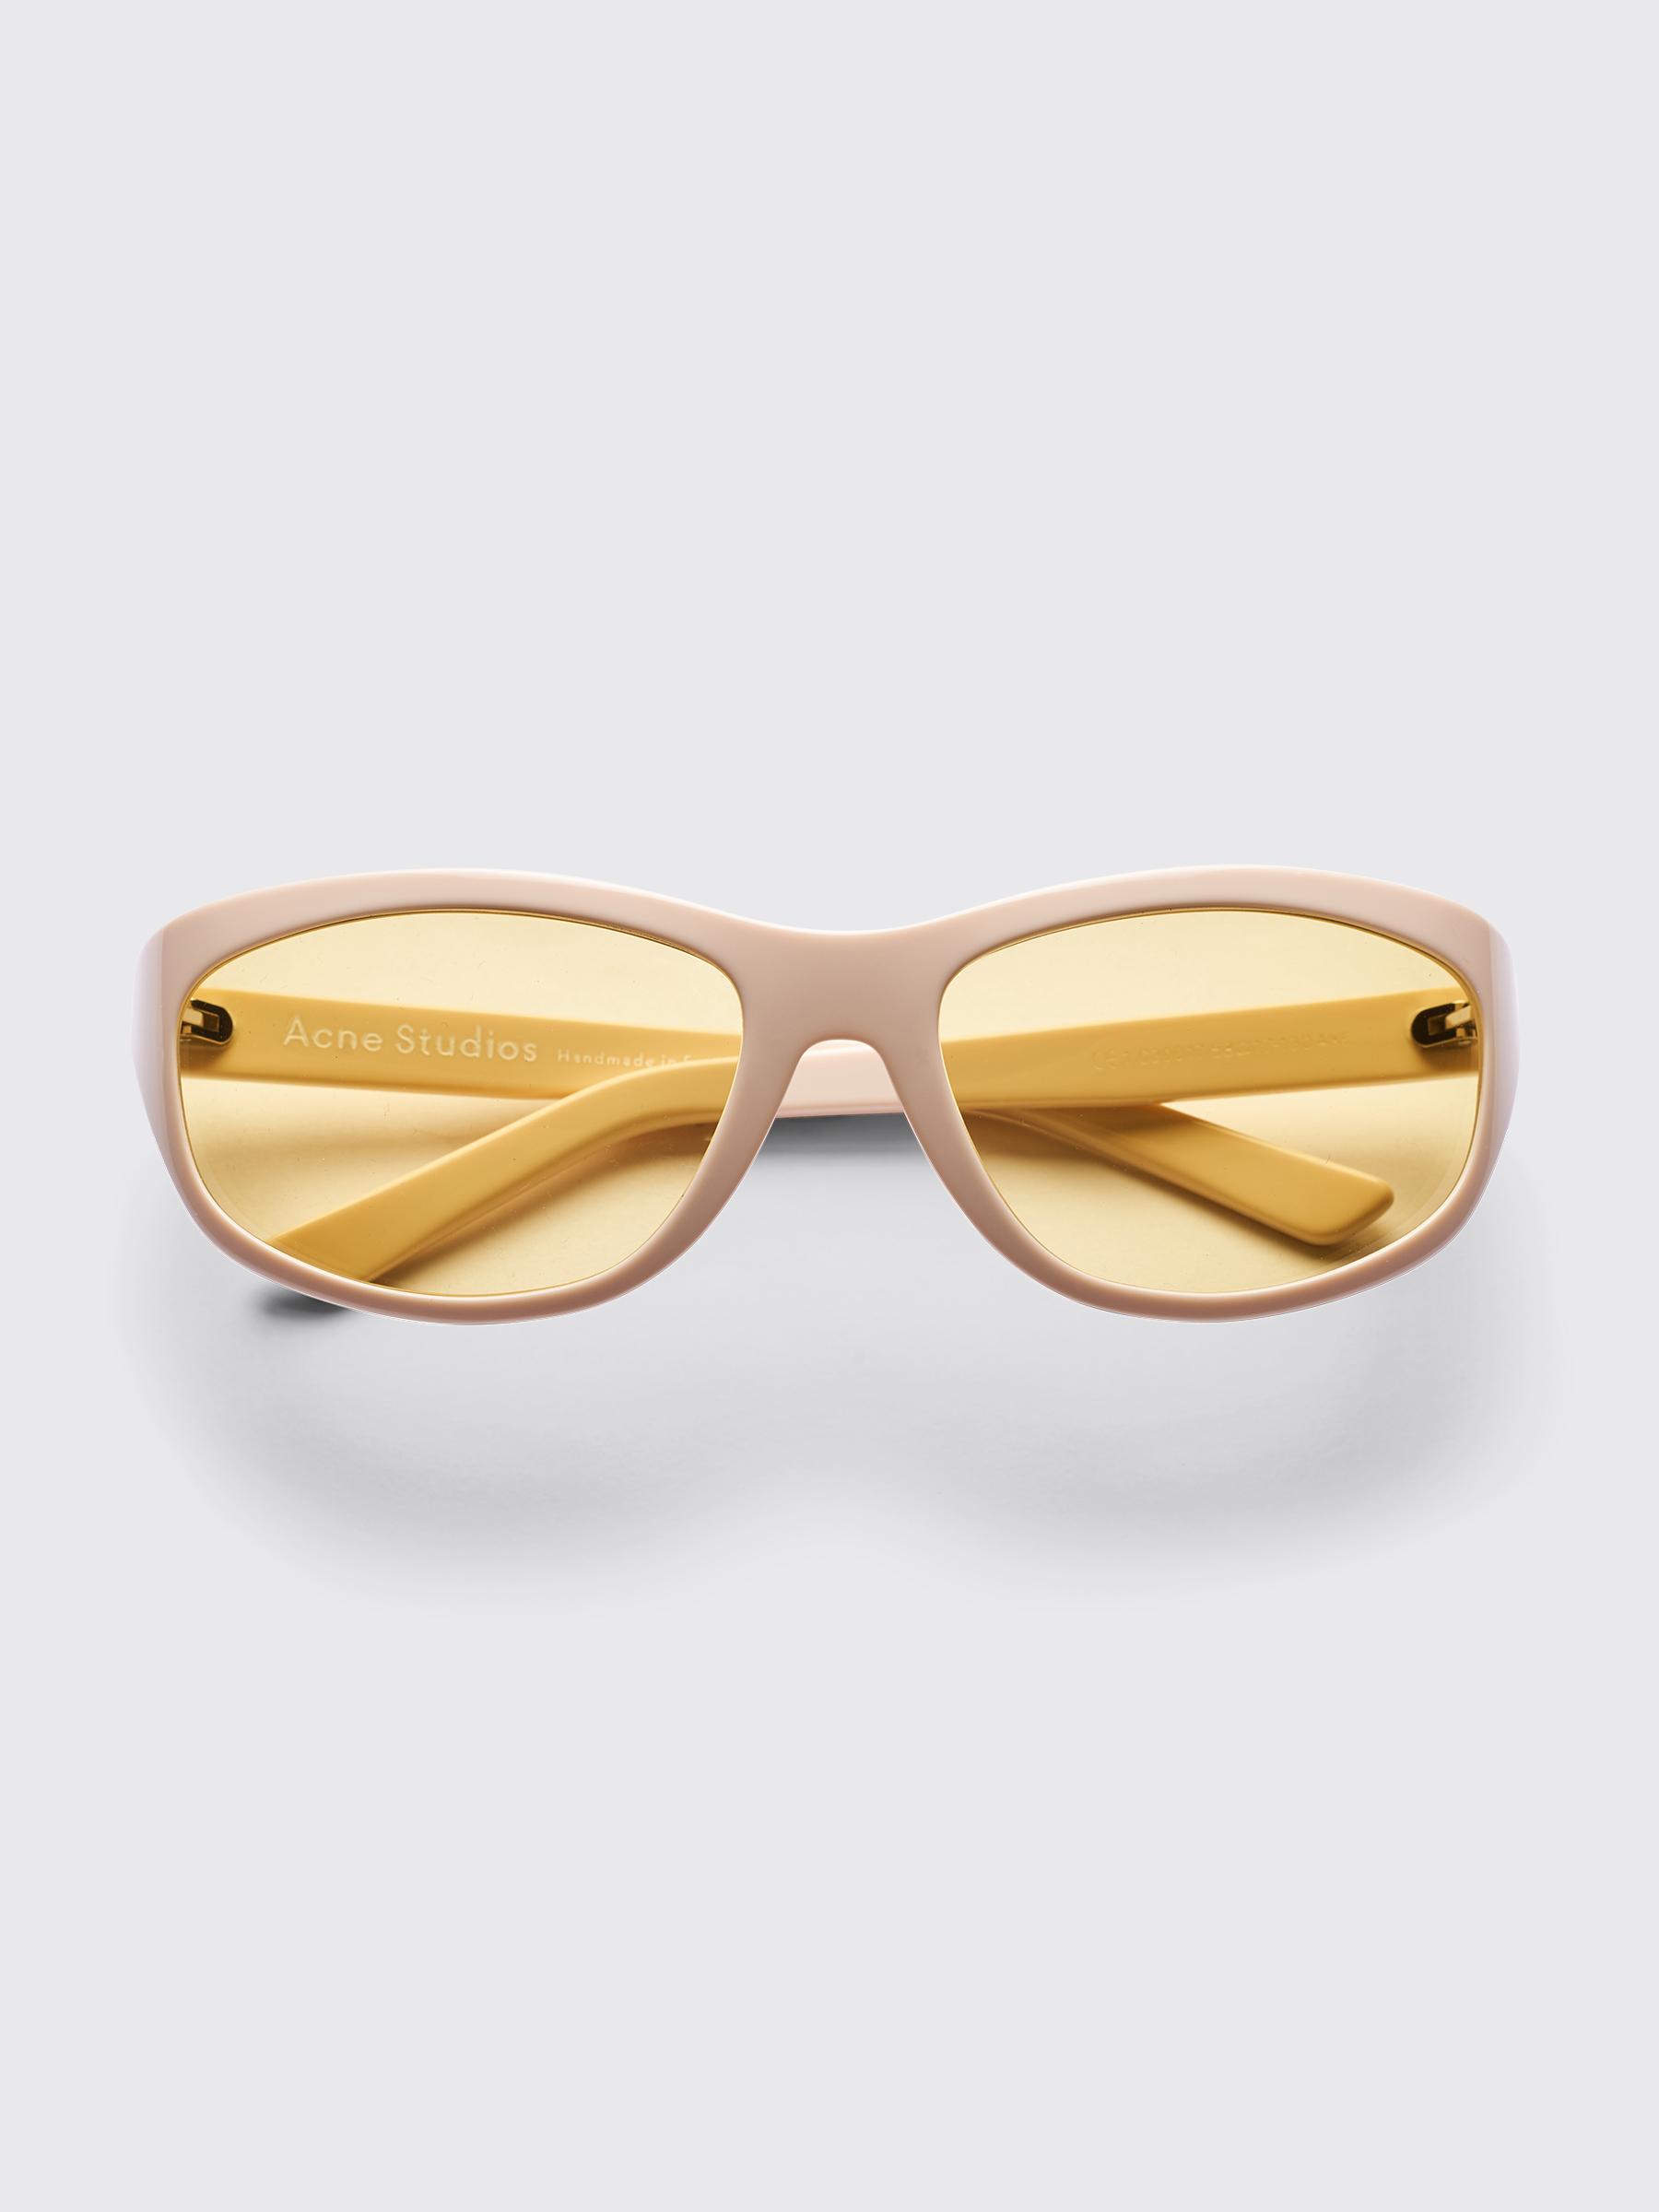 f6a5d2812e Très Bien - Acne Studios Lou Sunglasses Cream White   Yellow